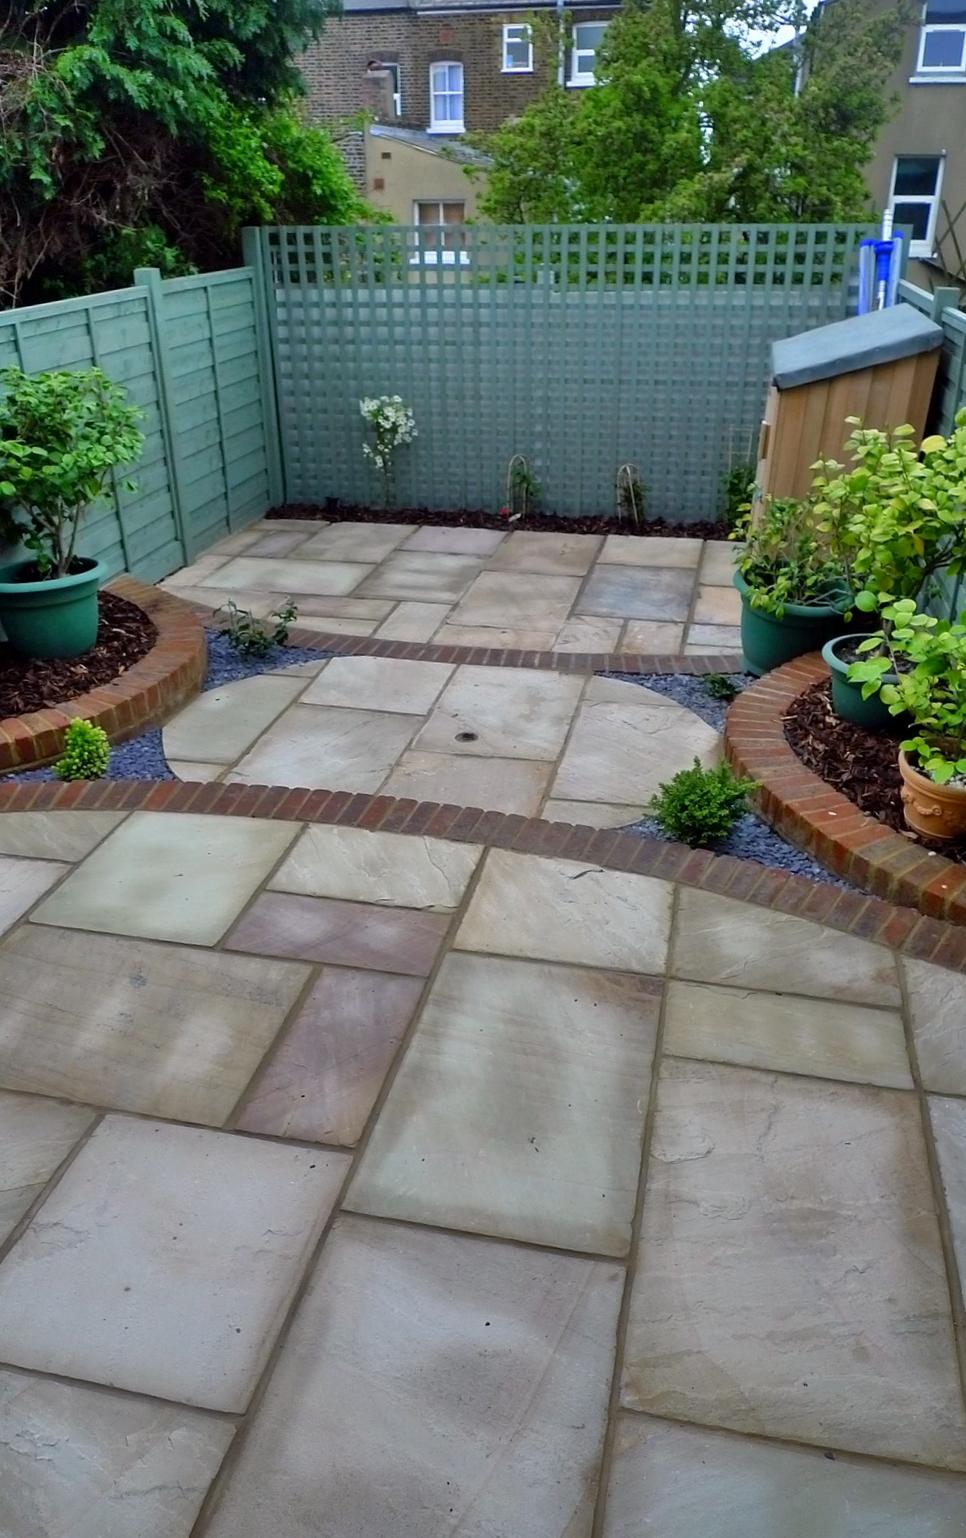 Circles Of Paving Sandstone Brick Edge Raised Beds London London Garden Blog